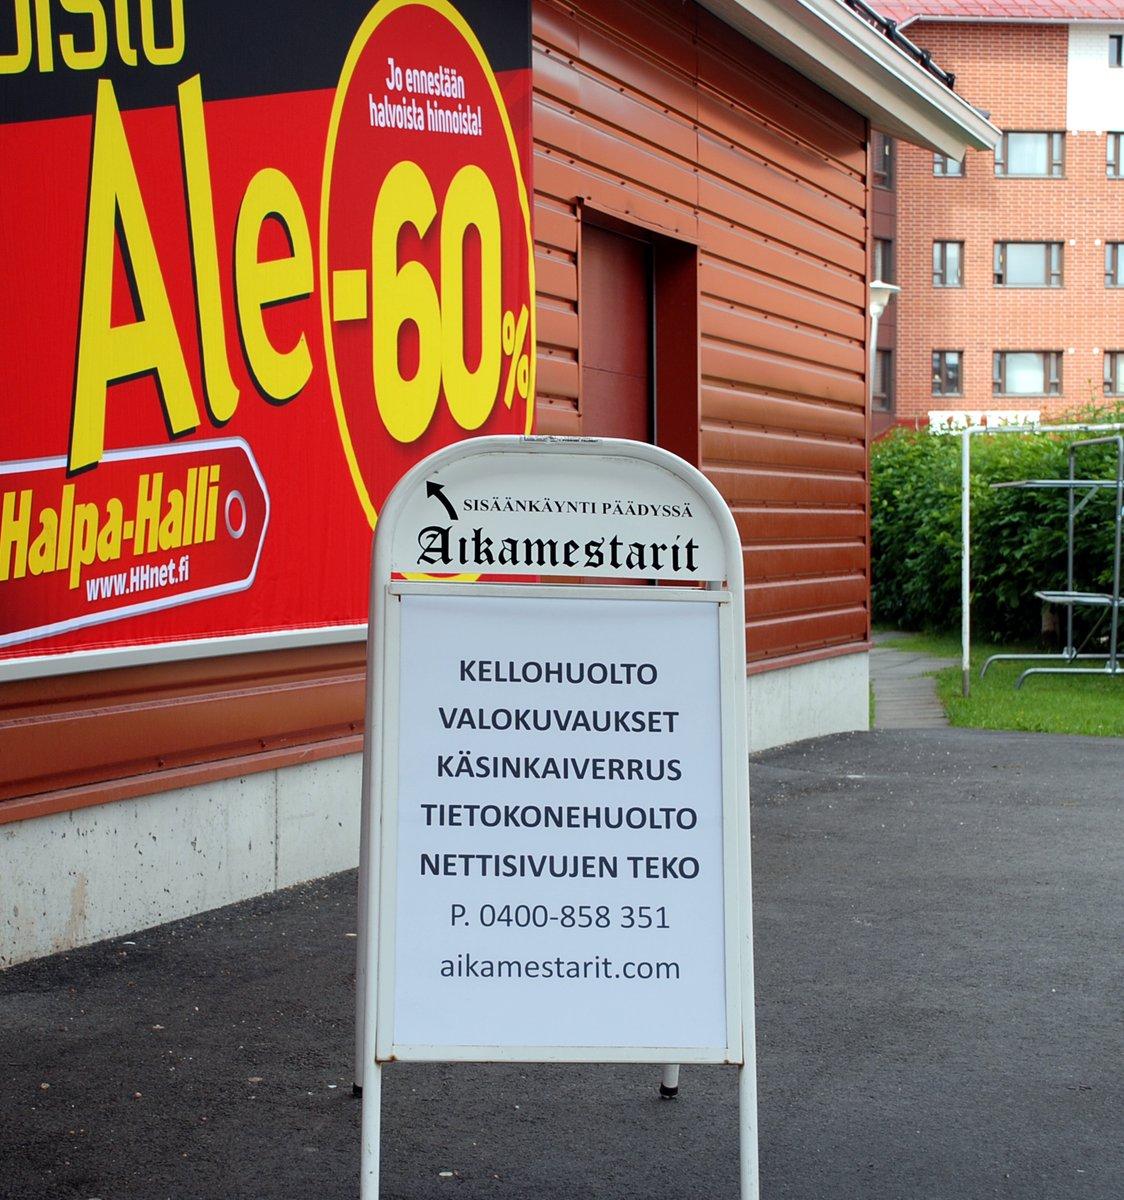 HeikkiOjala photo